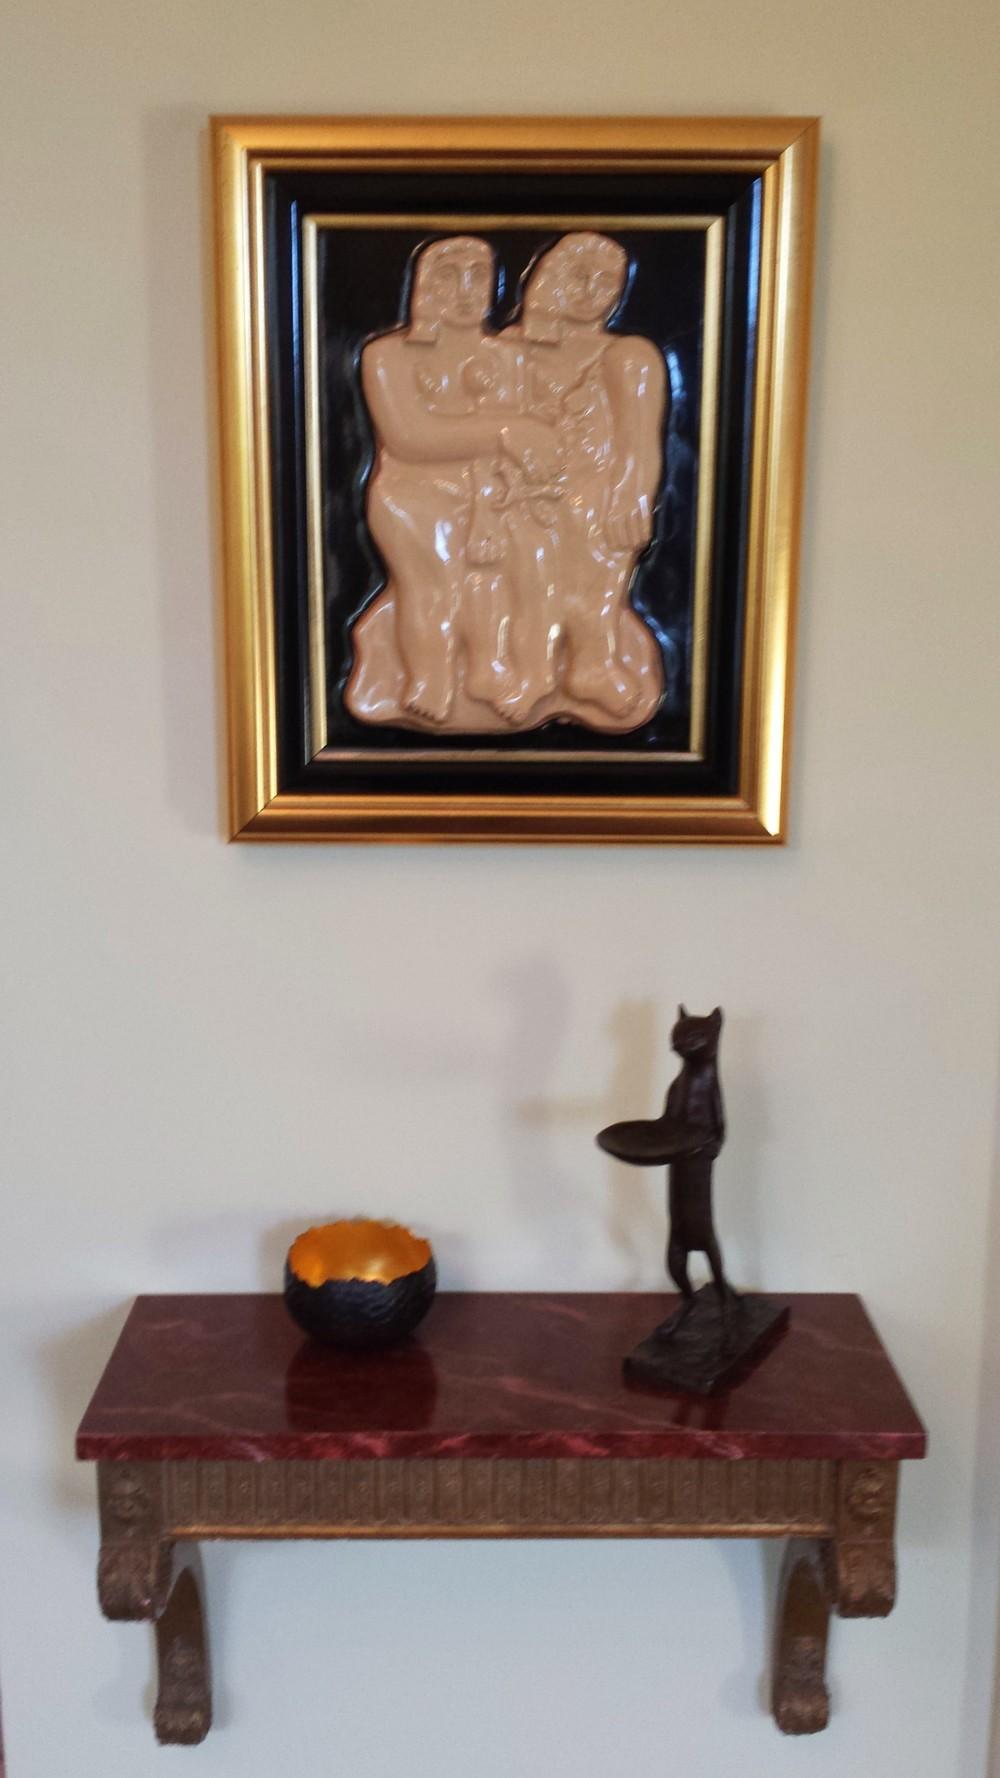 Fernand Léger & Alberto Giacometti